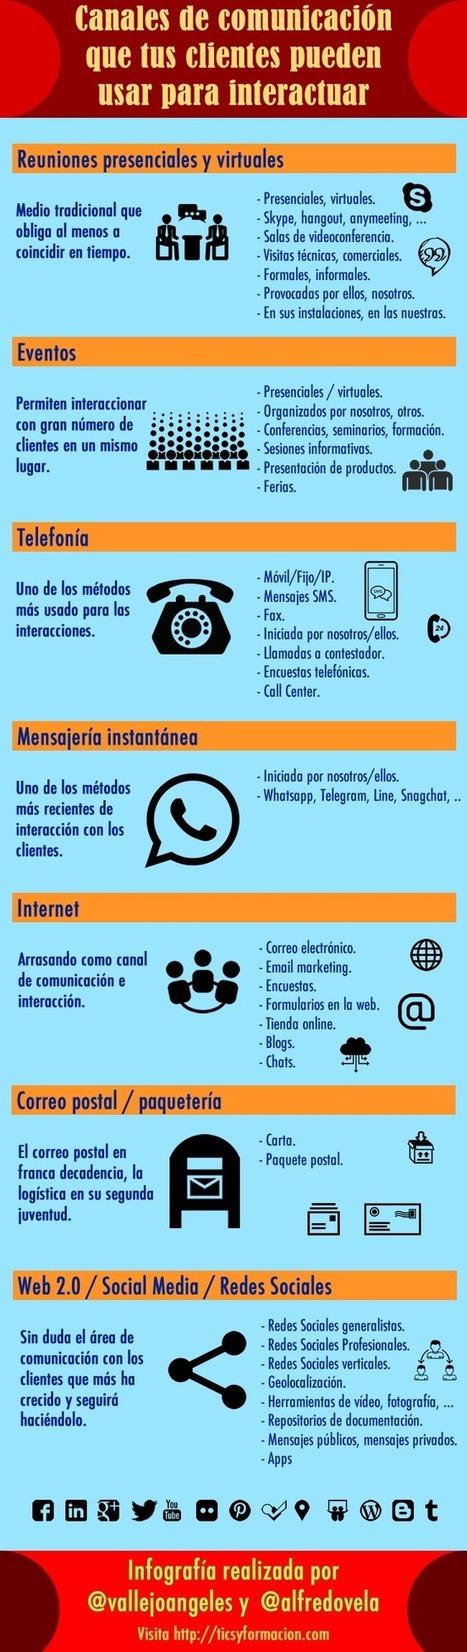 Canales de comunicación para interactuar con tus clientes #infografia #infographic #marketing | Periodismo | Scoop.it